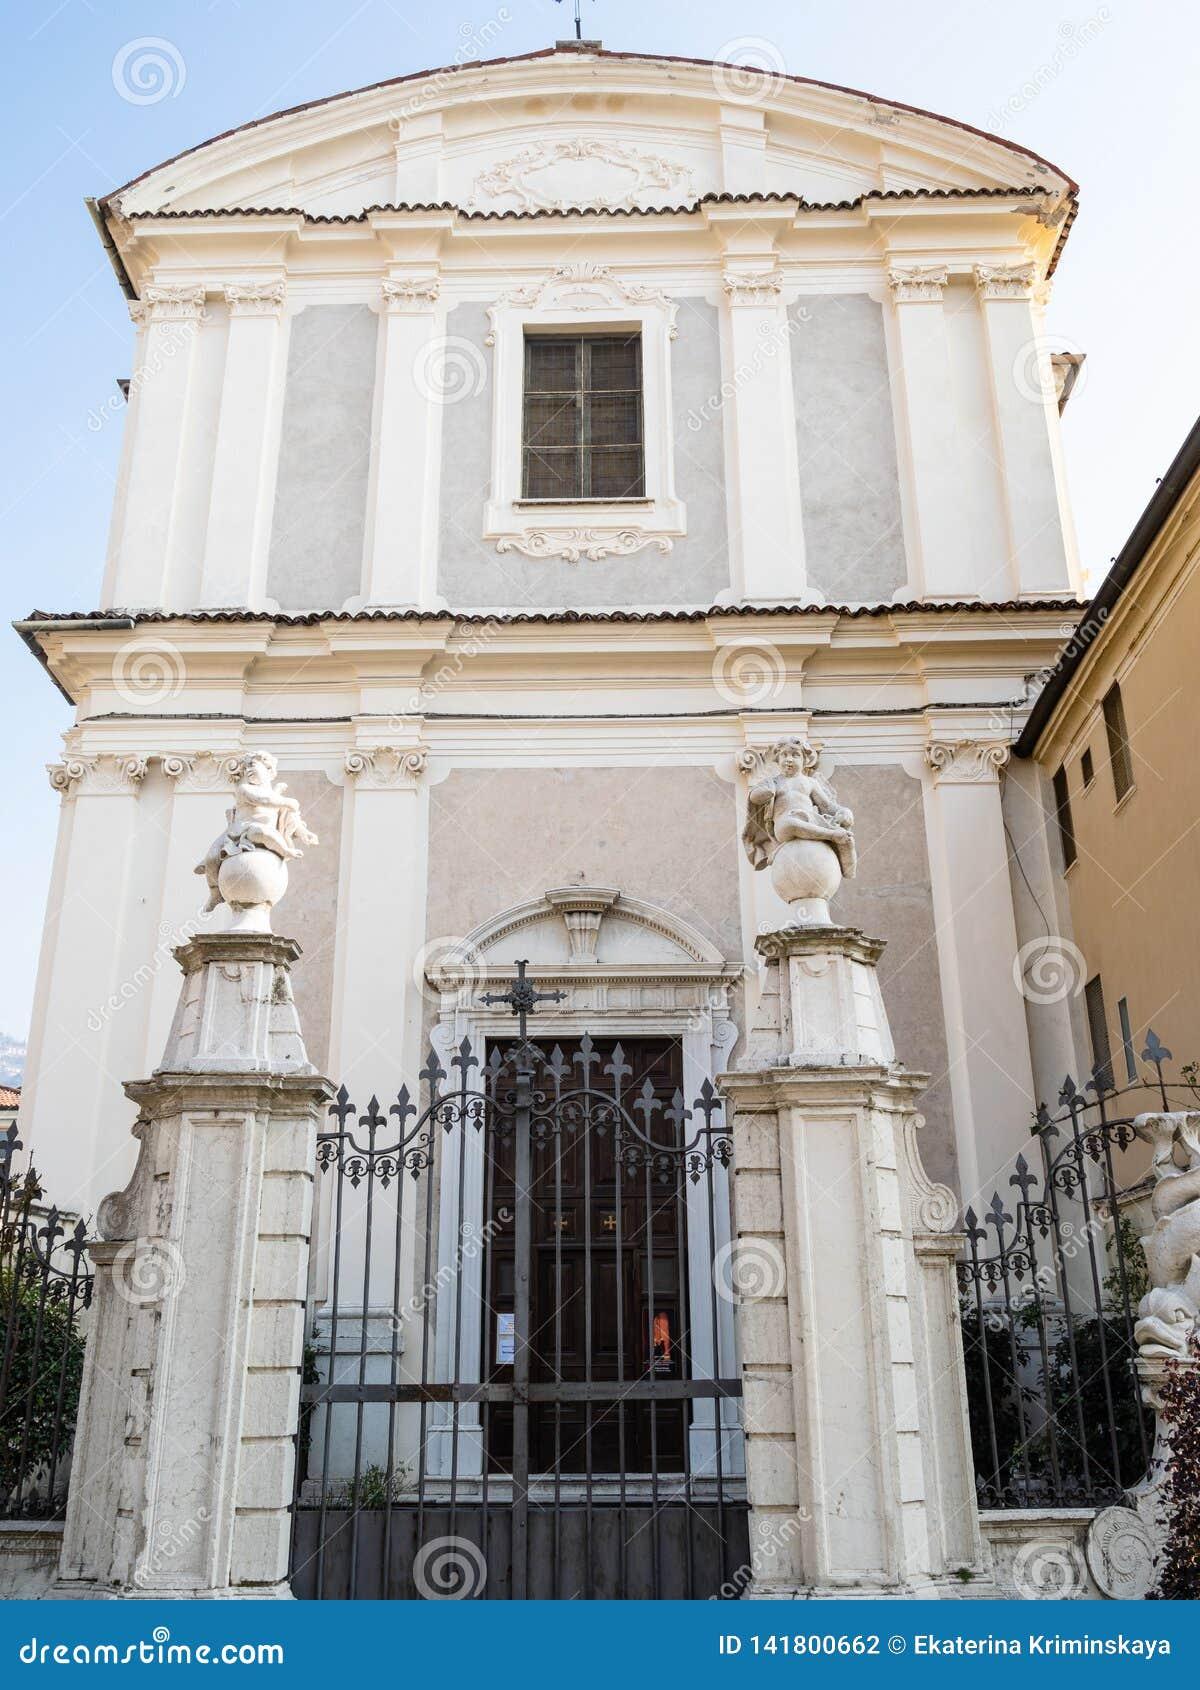 Vista de la iglesia Chiesa di San Zeno en la ciudad de Brescia